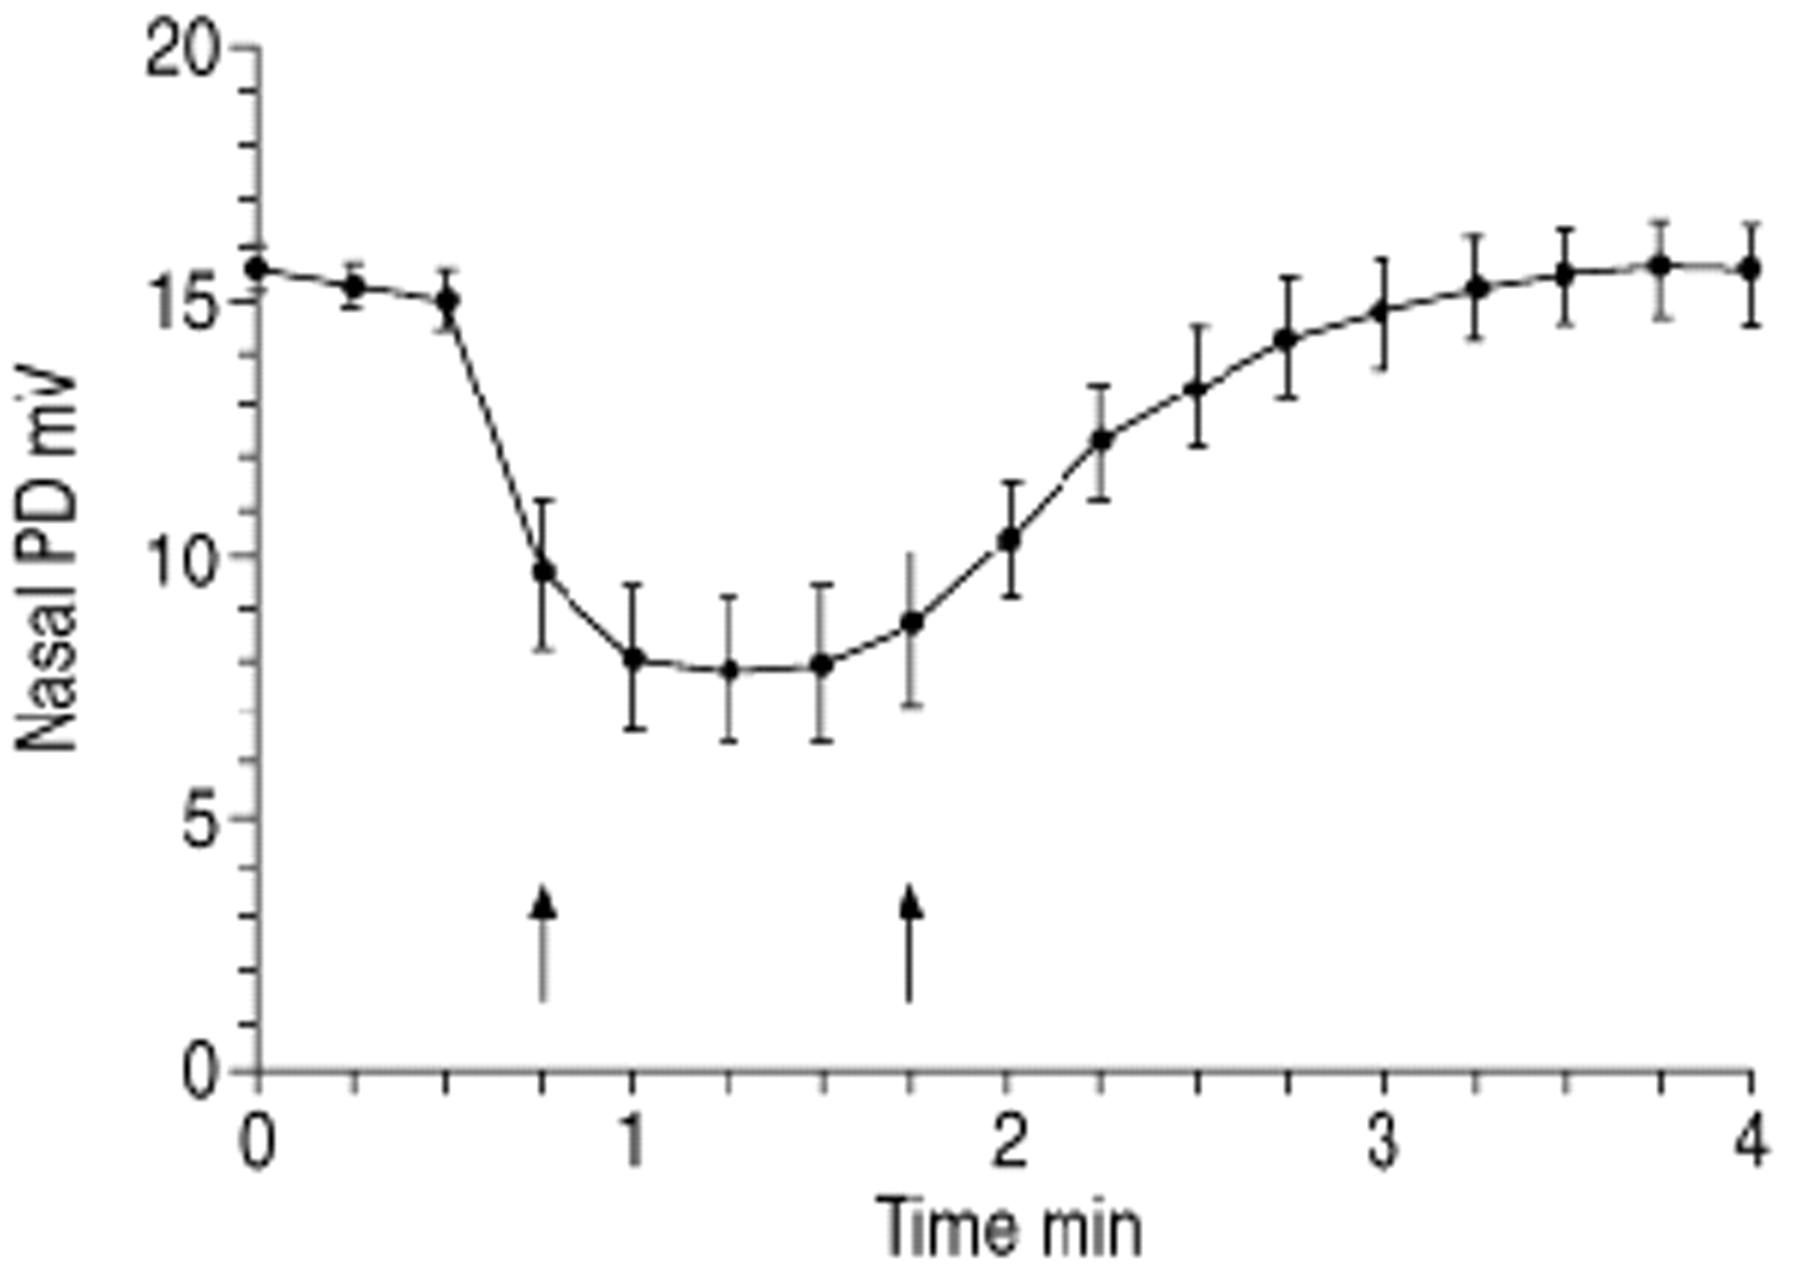 Hypertonic Saline Alters Ion Transport Across The Human